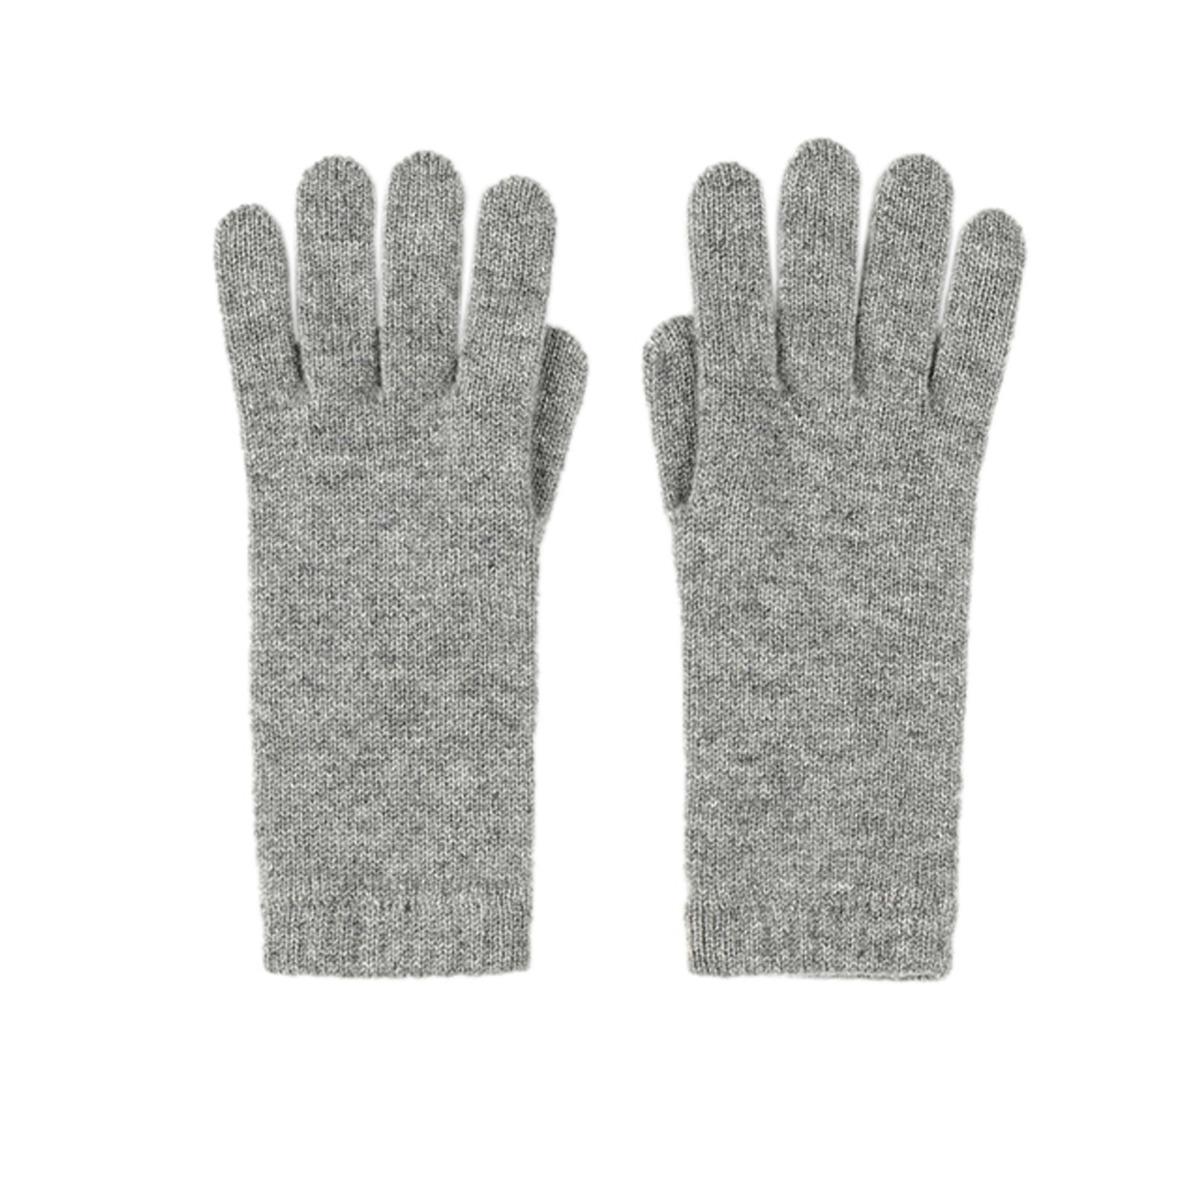 Light grey cashmere women's gloves